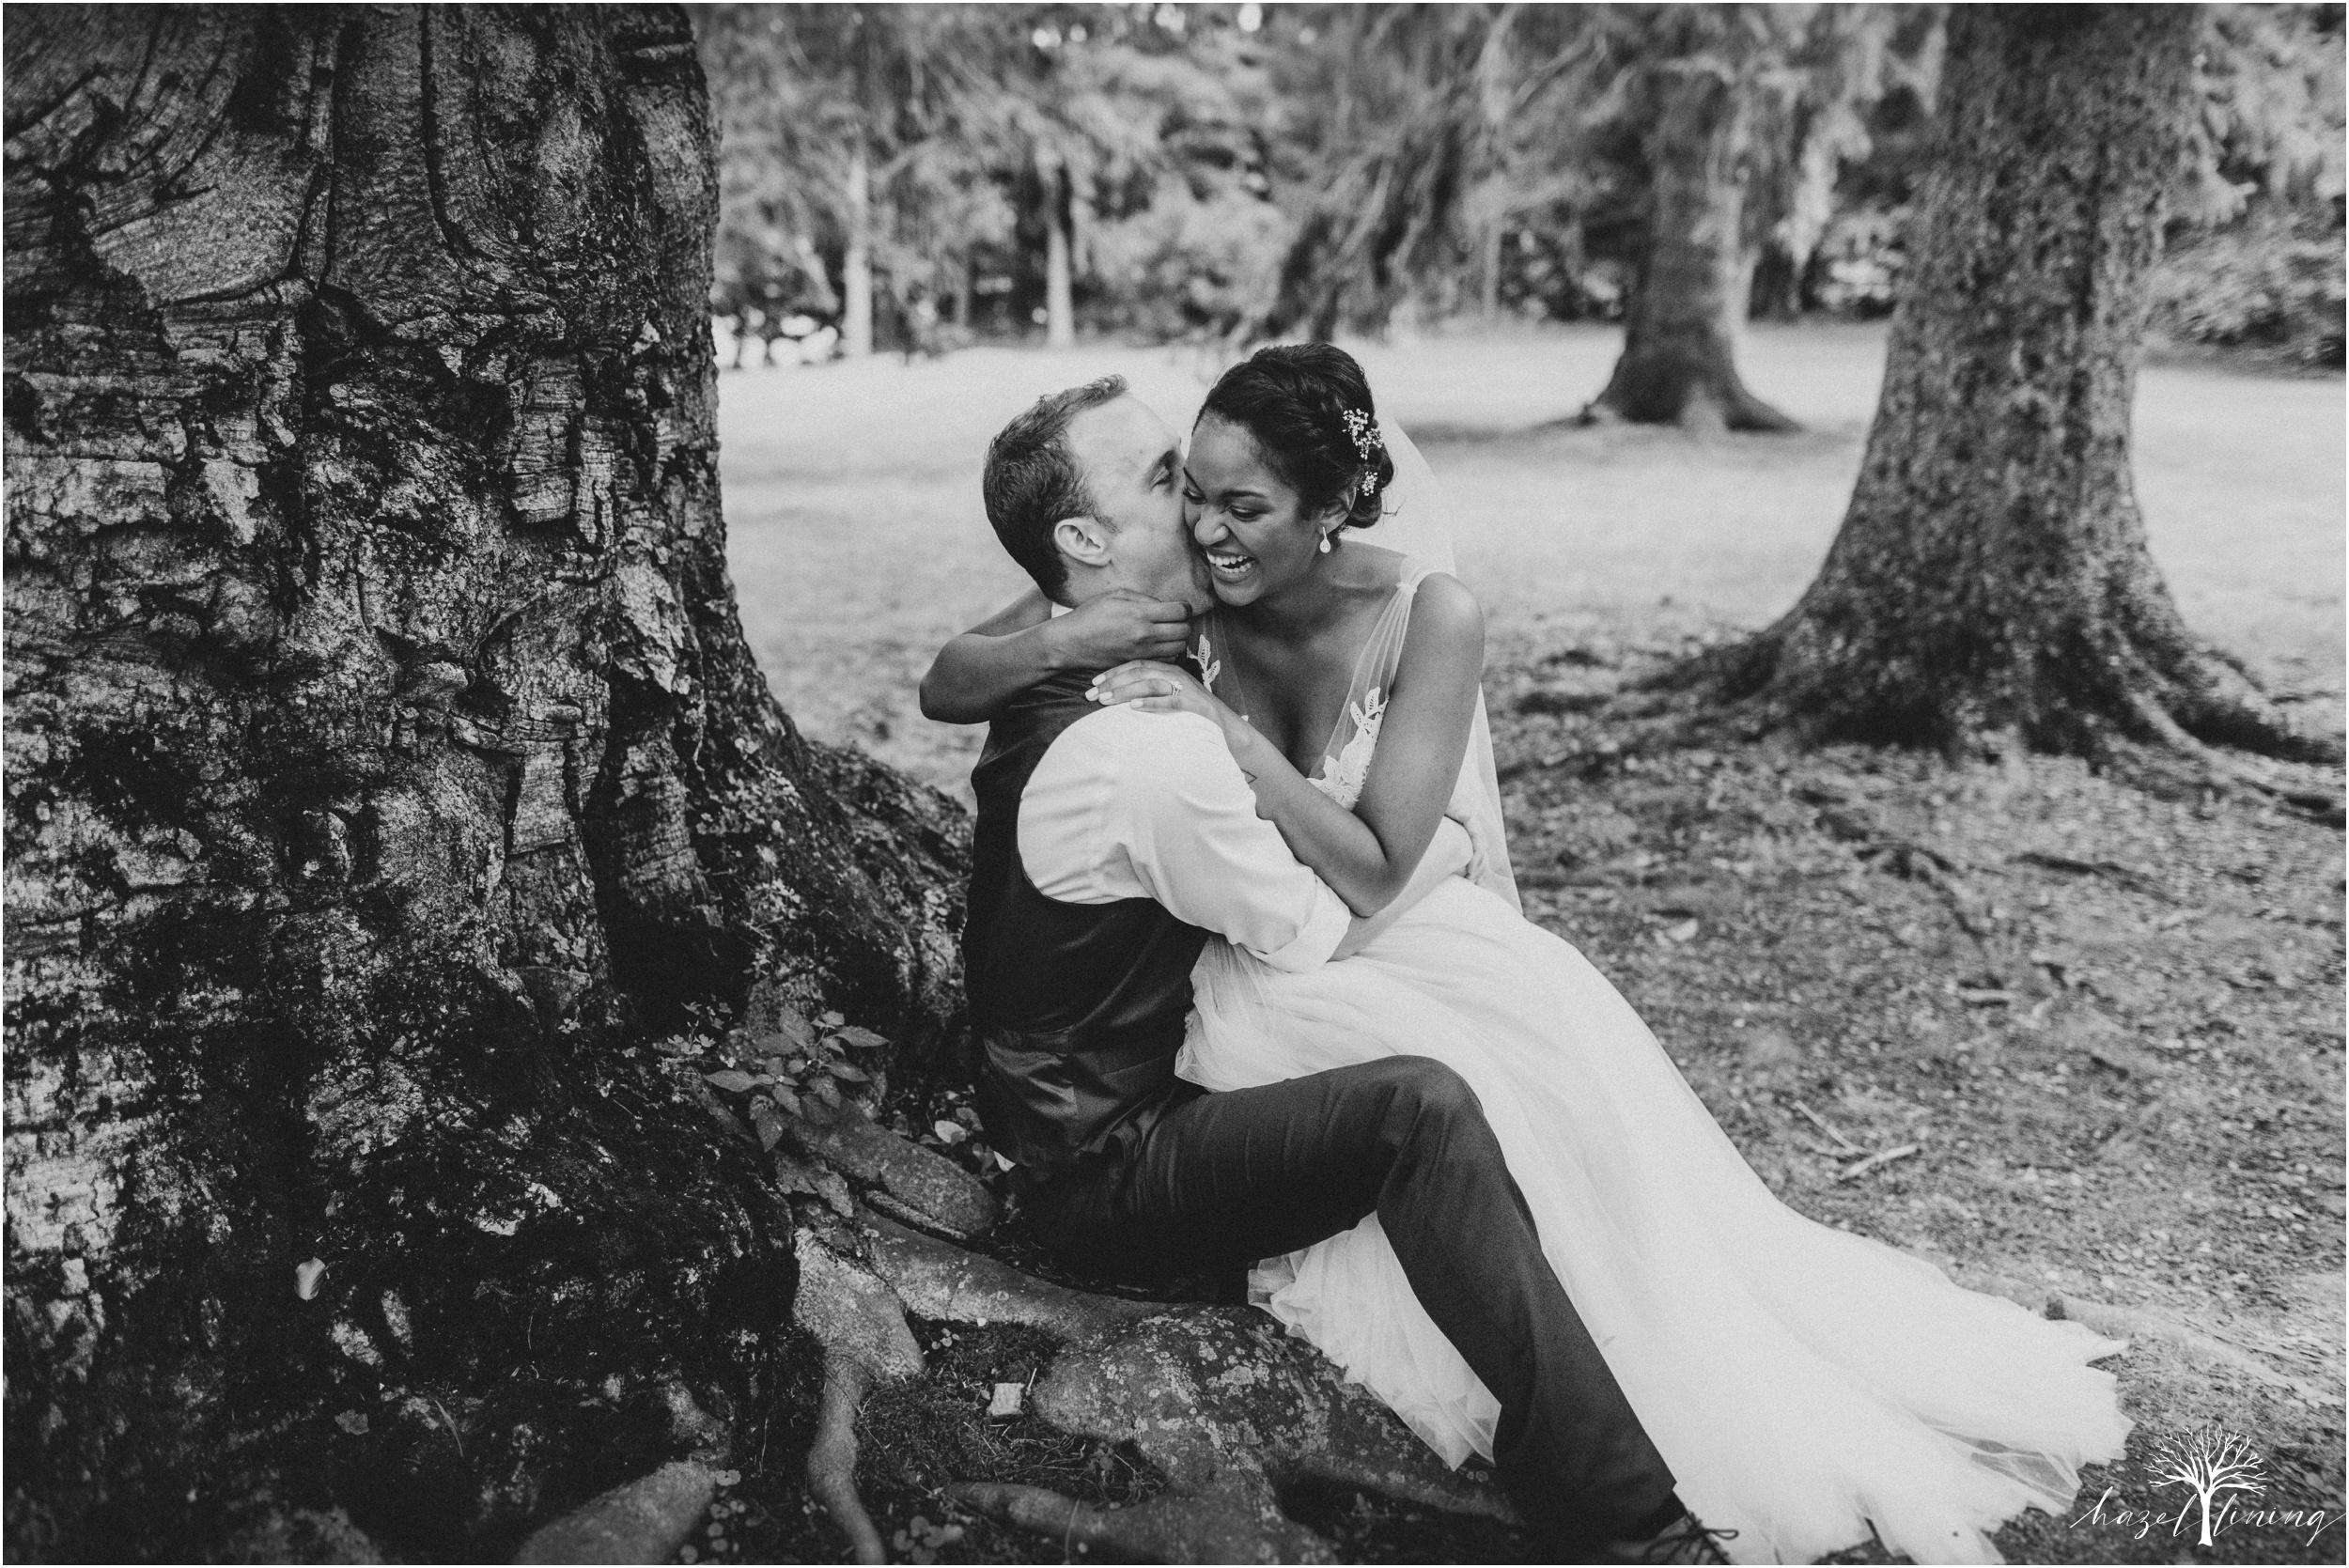 mariah-kreyling-samuel-sherratt-sherrattwiththeworld-peirce-farm-at-witch-hill-boston-massachusetts-wedding-photography-hazel-lining-travel-wedding-elopement-photography_0129.jpg